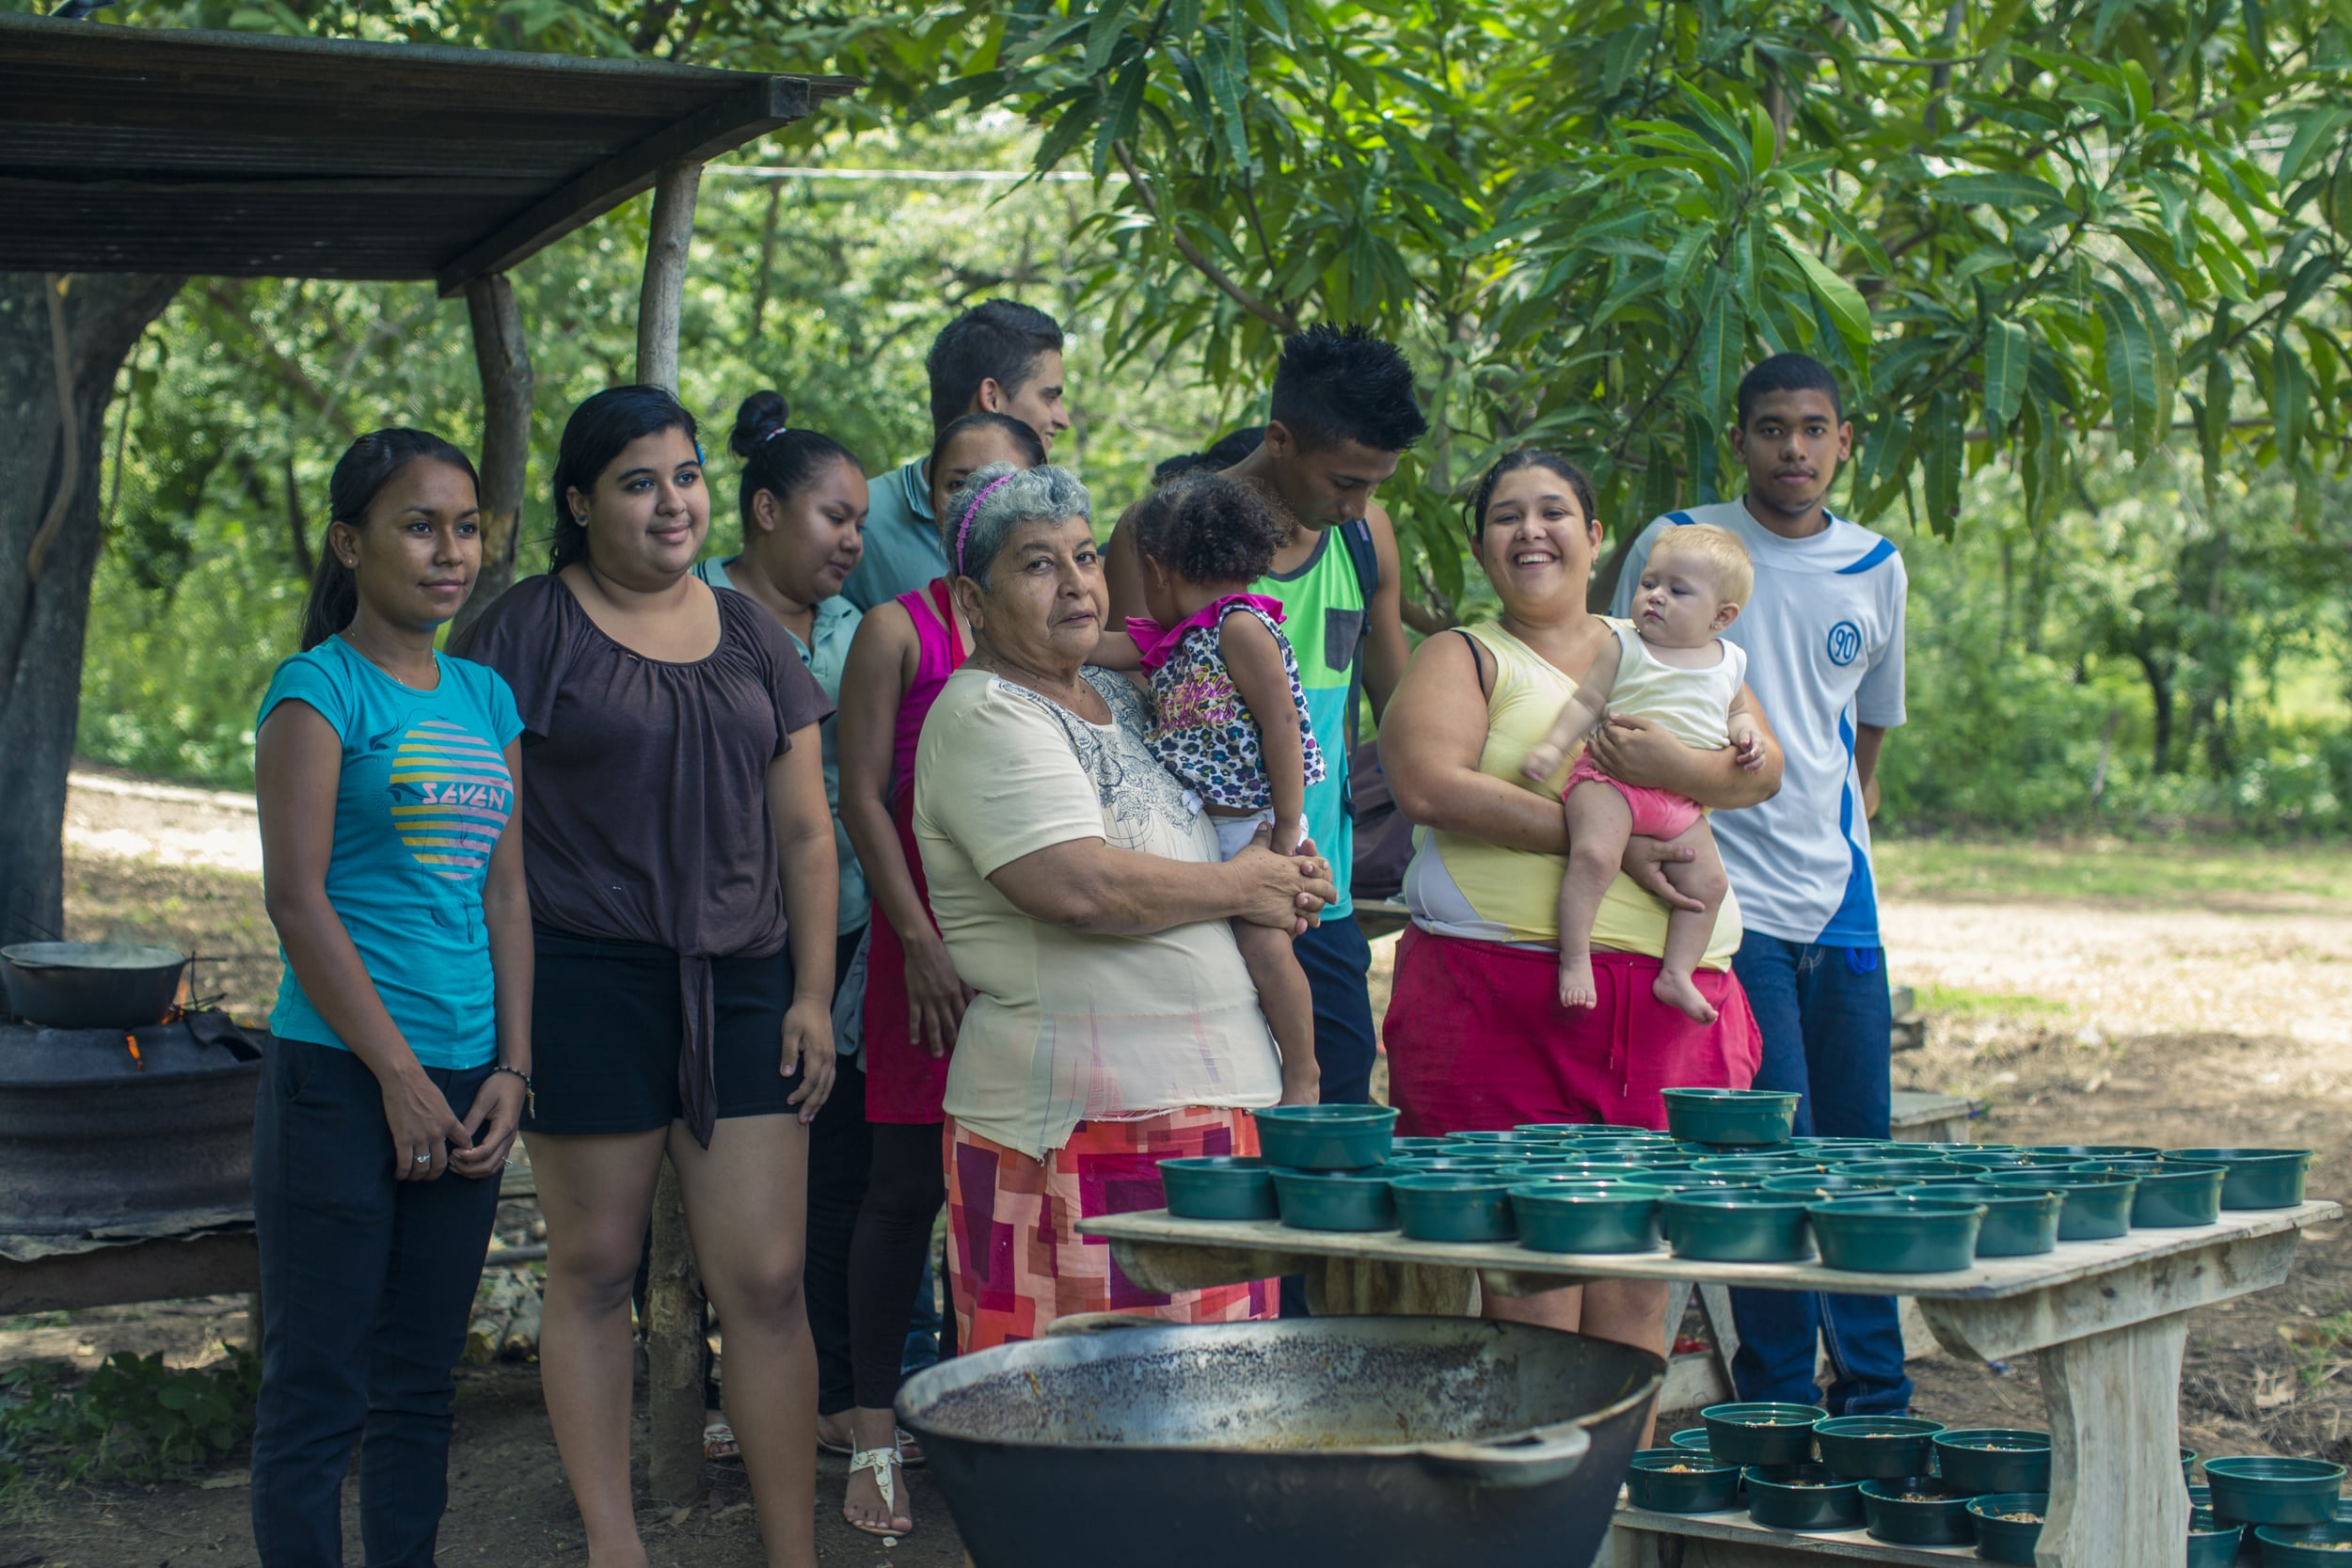 Grupo comunal preparan comida para vender y recaudar fondos para actividades escolares.